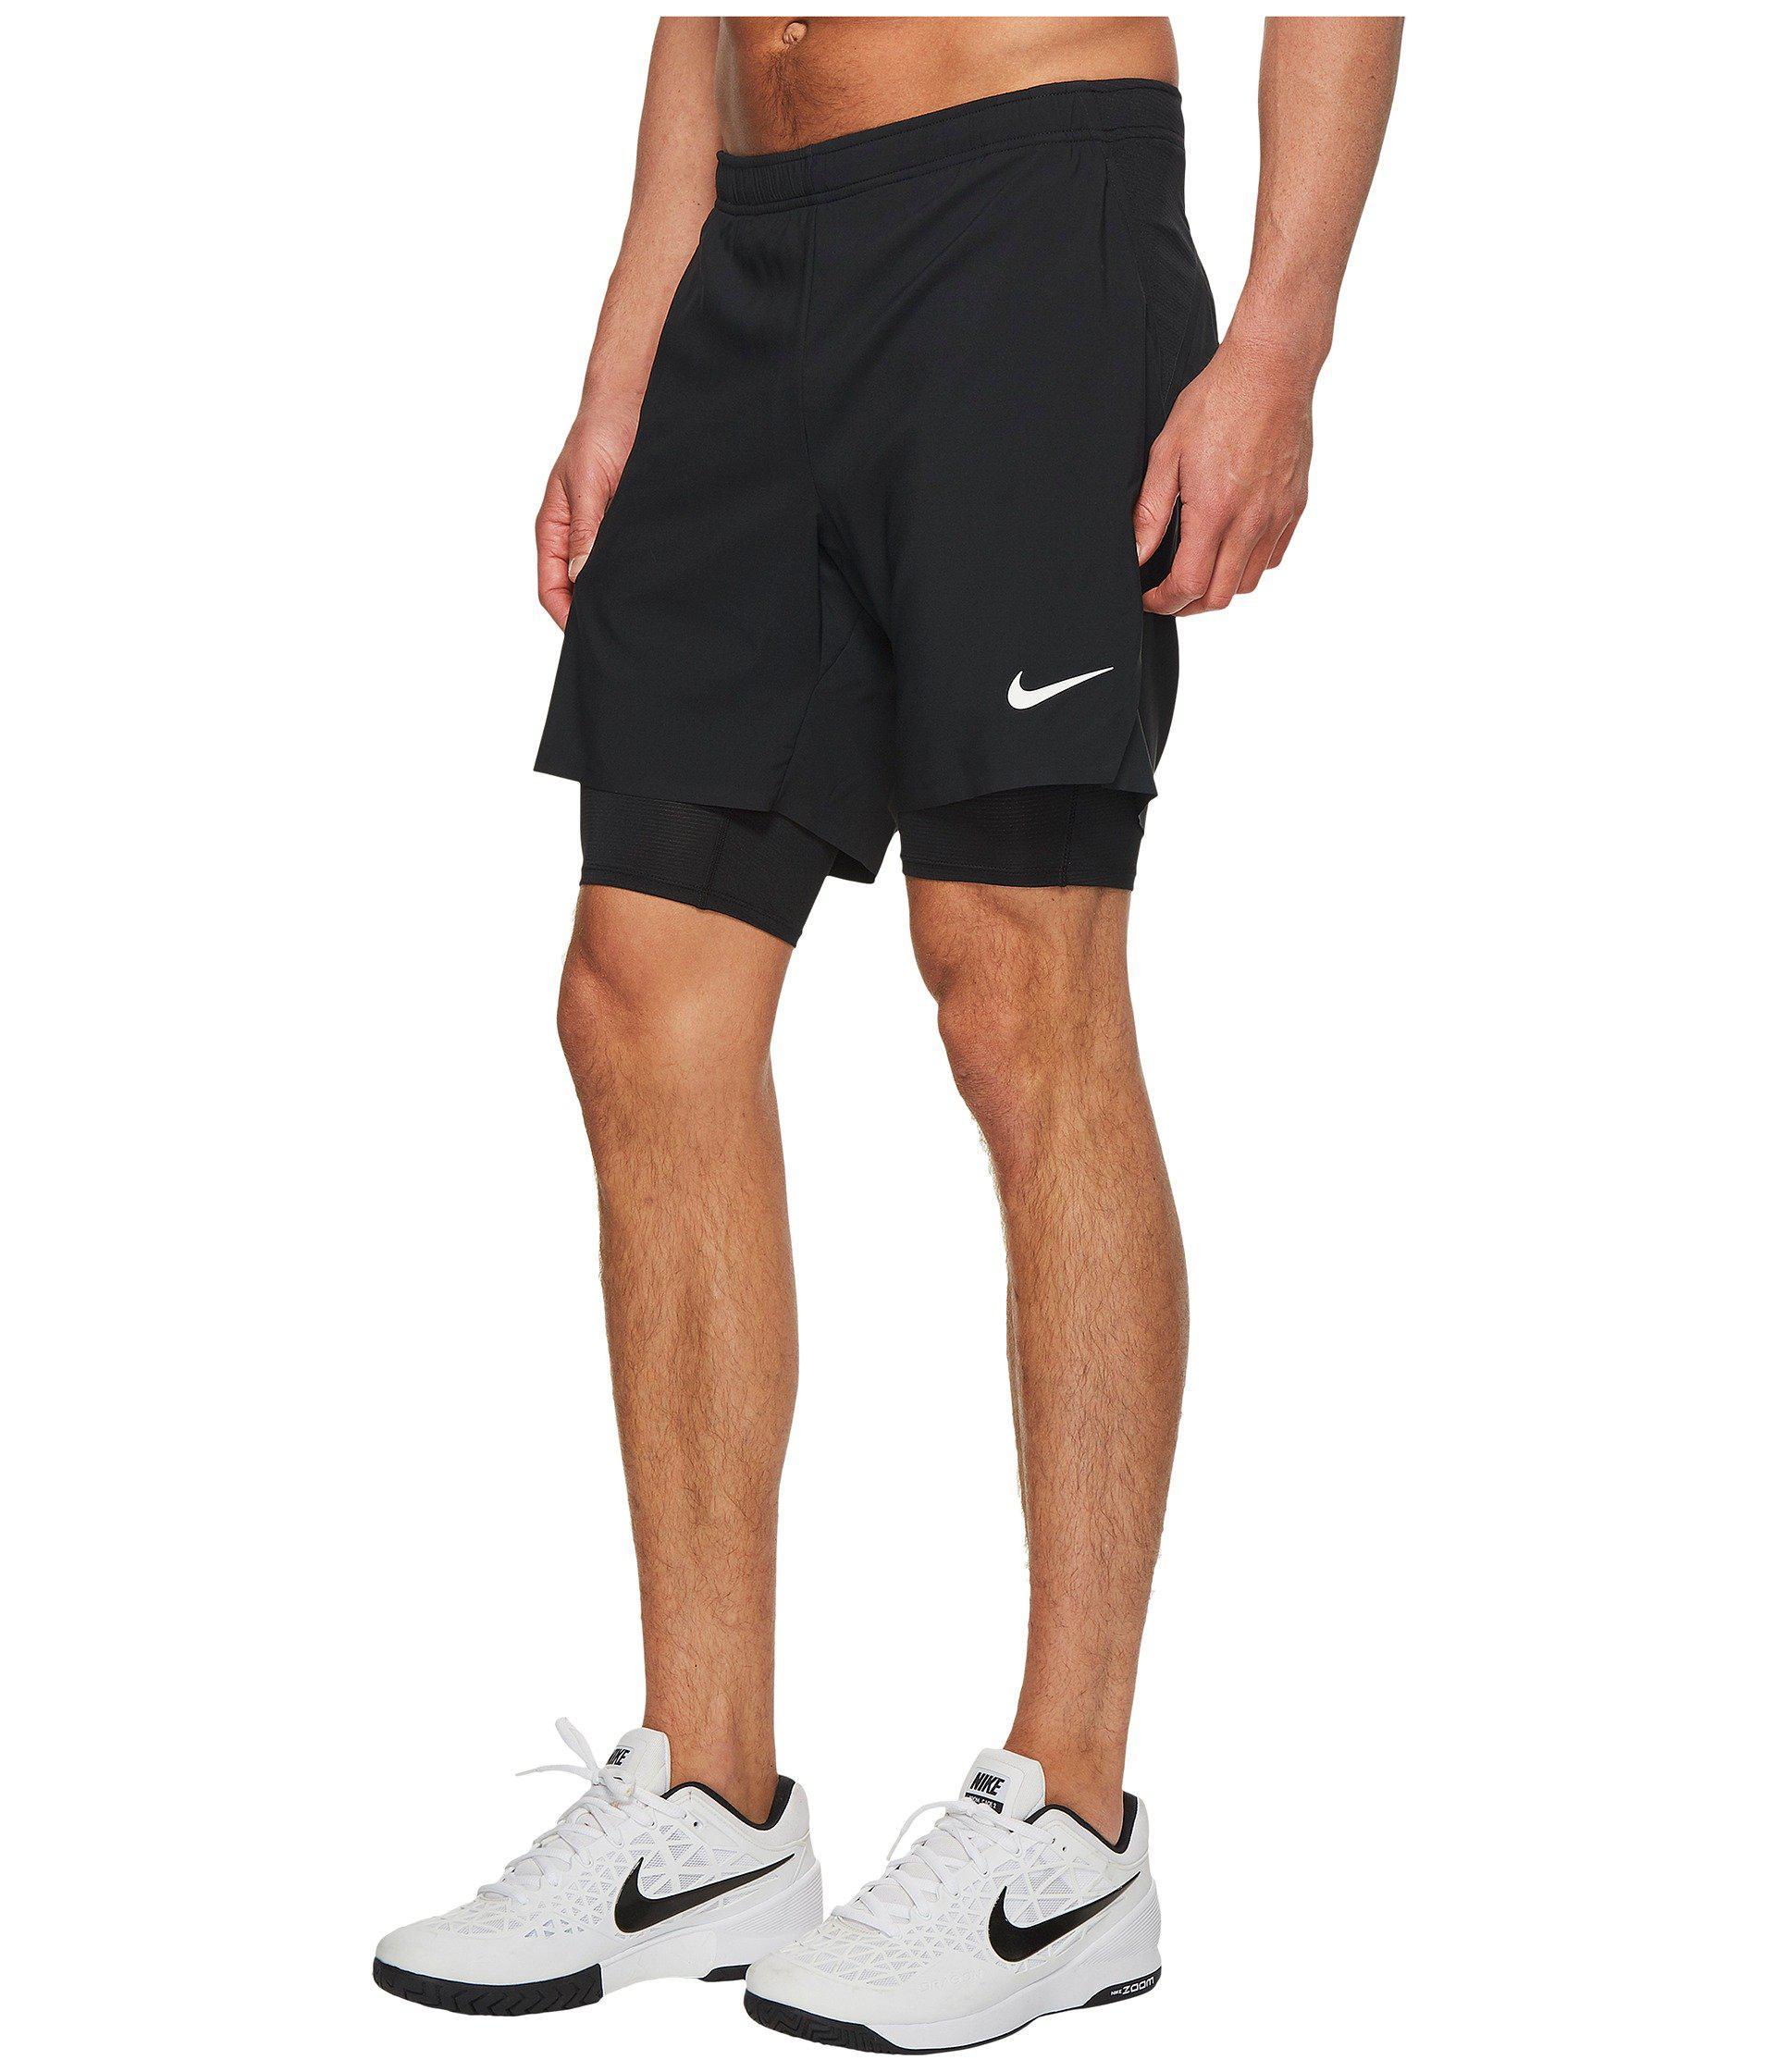 fe75f82026da Lyst - Nike Court Flex Ace 7